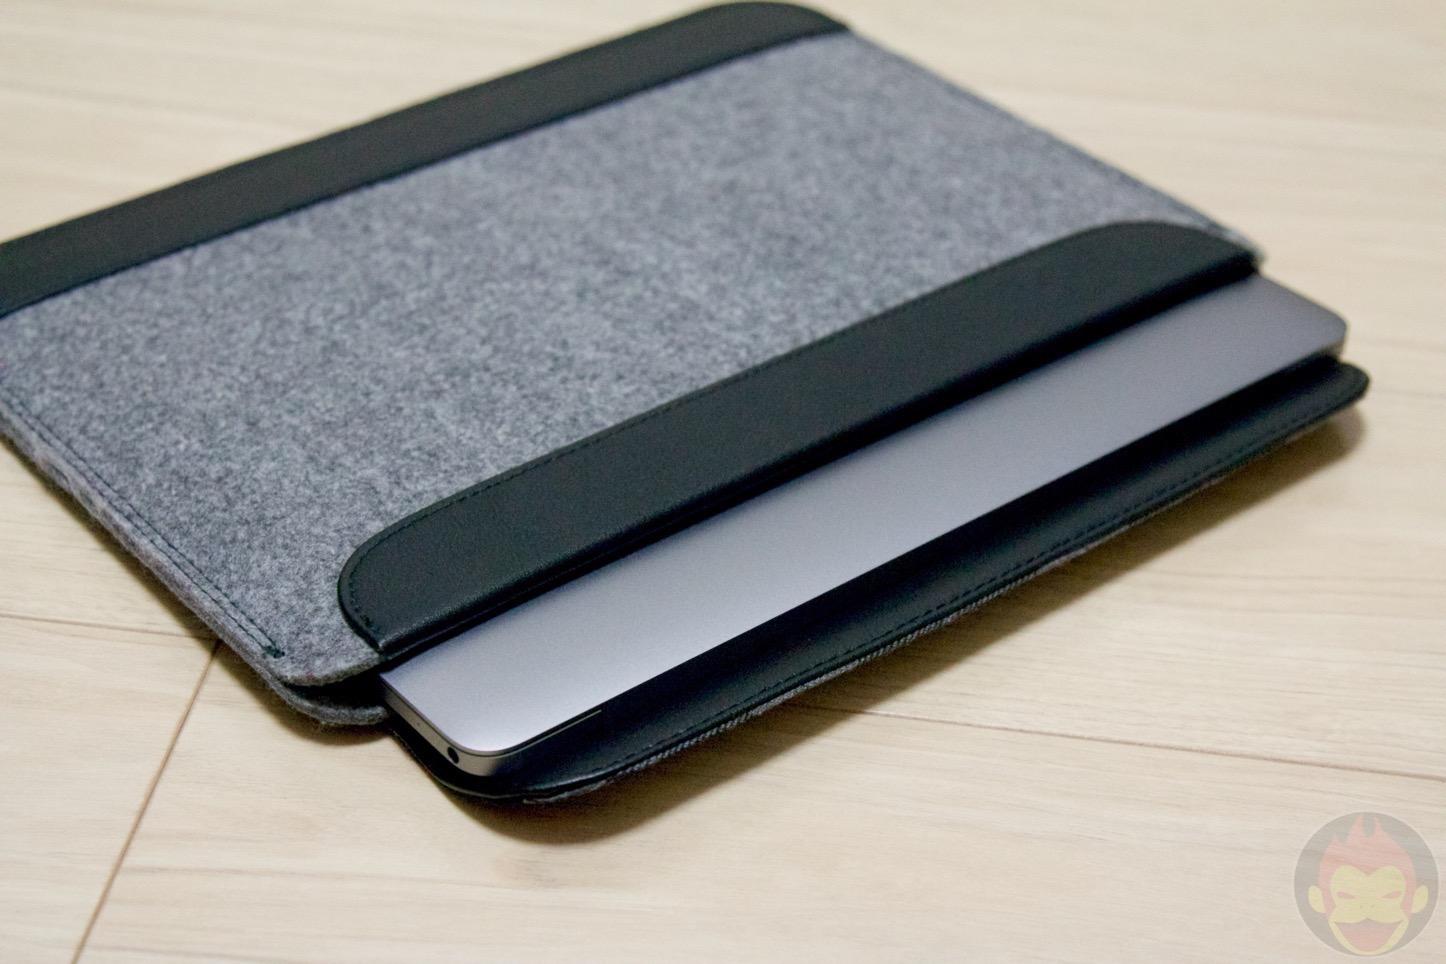 Inateck-12inch-MacBook-Case-006.jpg